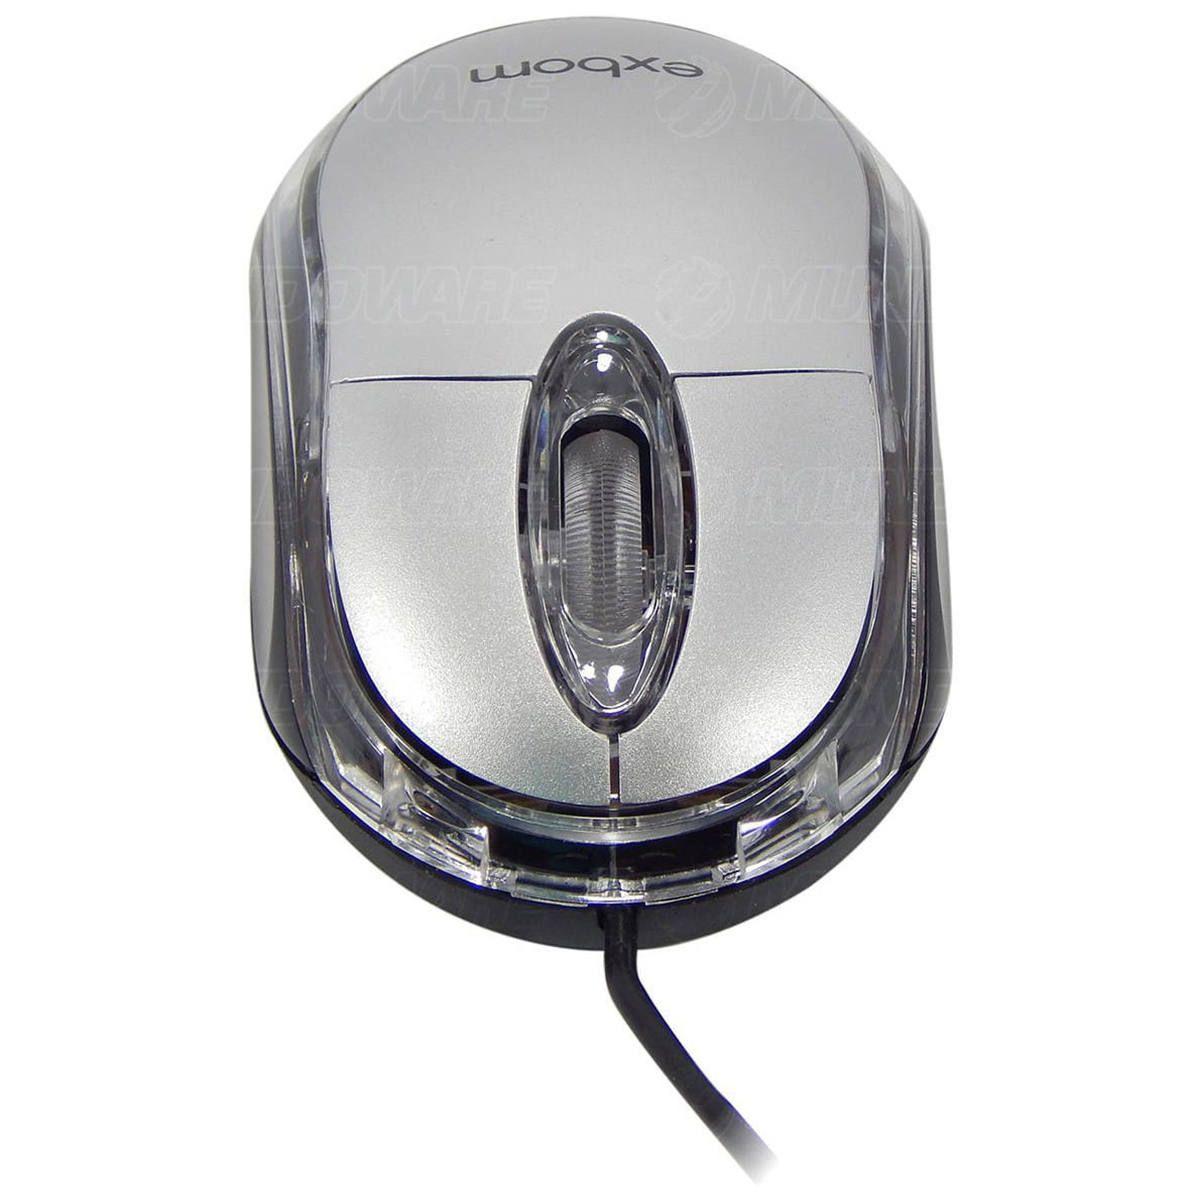 Mini Mouse USB 1000dpi Óptico LED Azul com Scroll Exbom MS-10 Prata